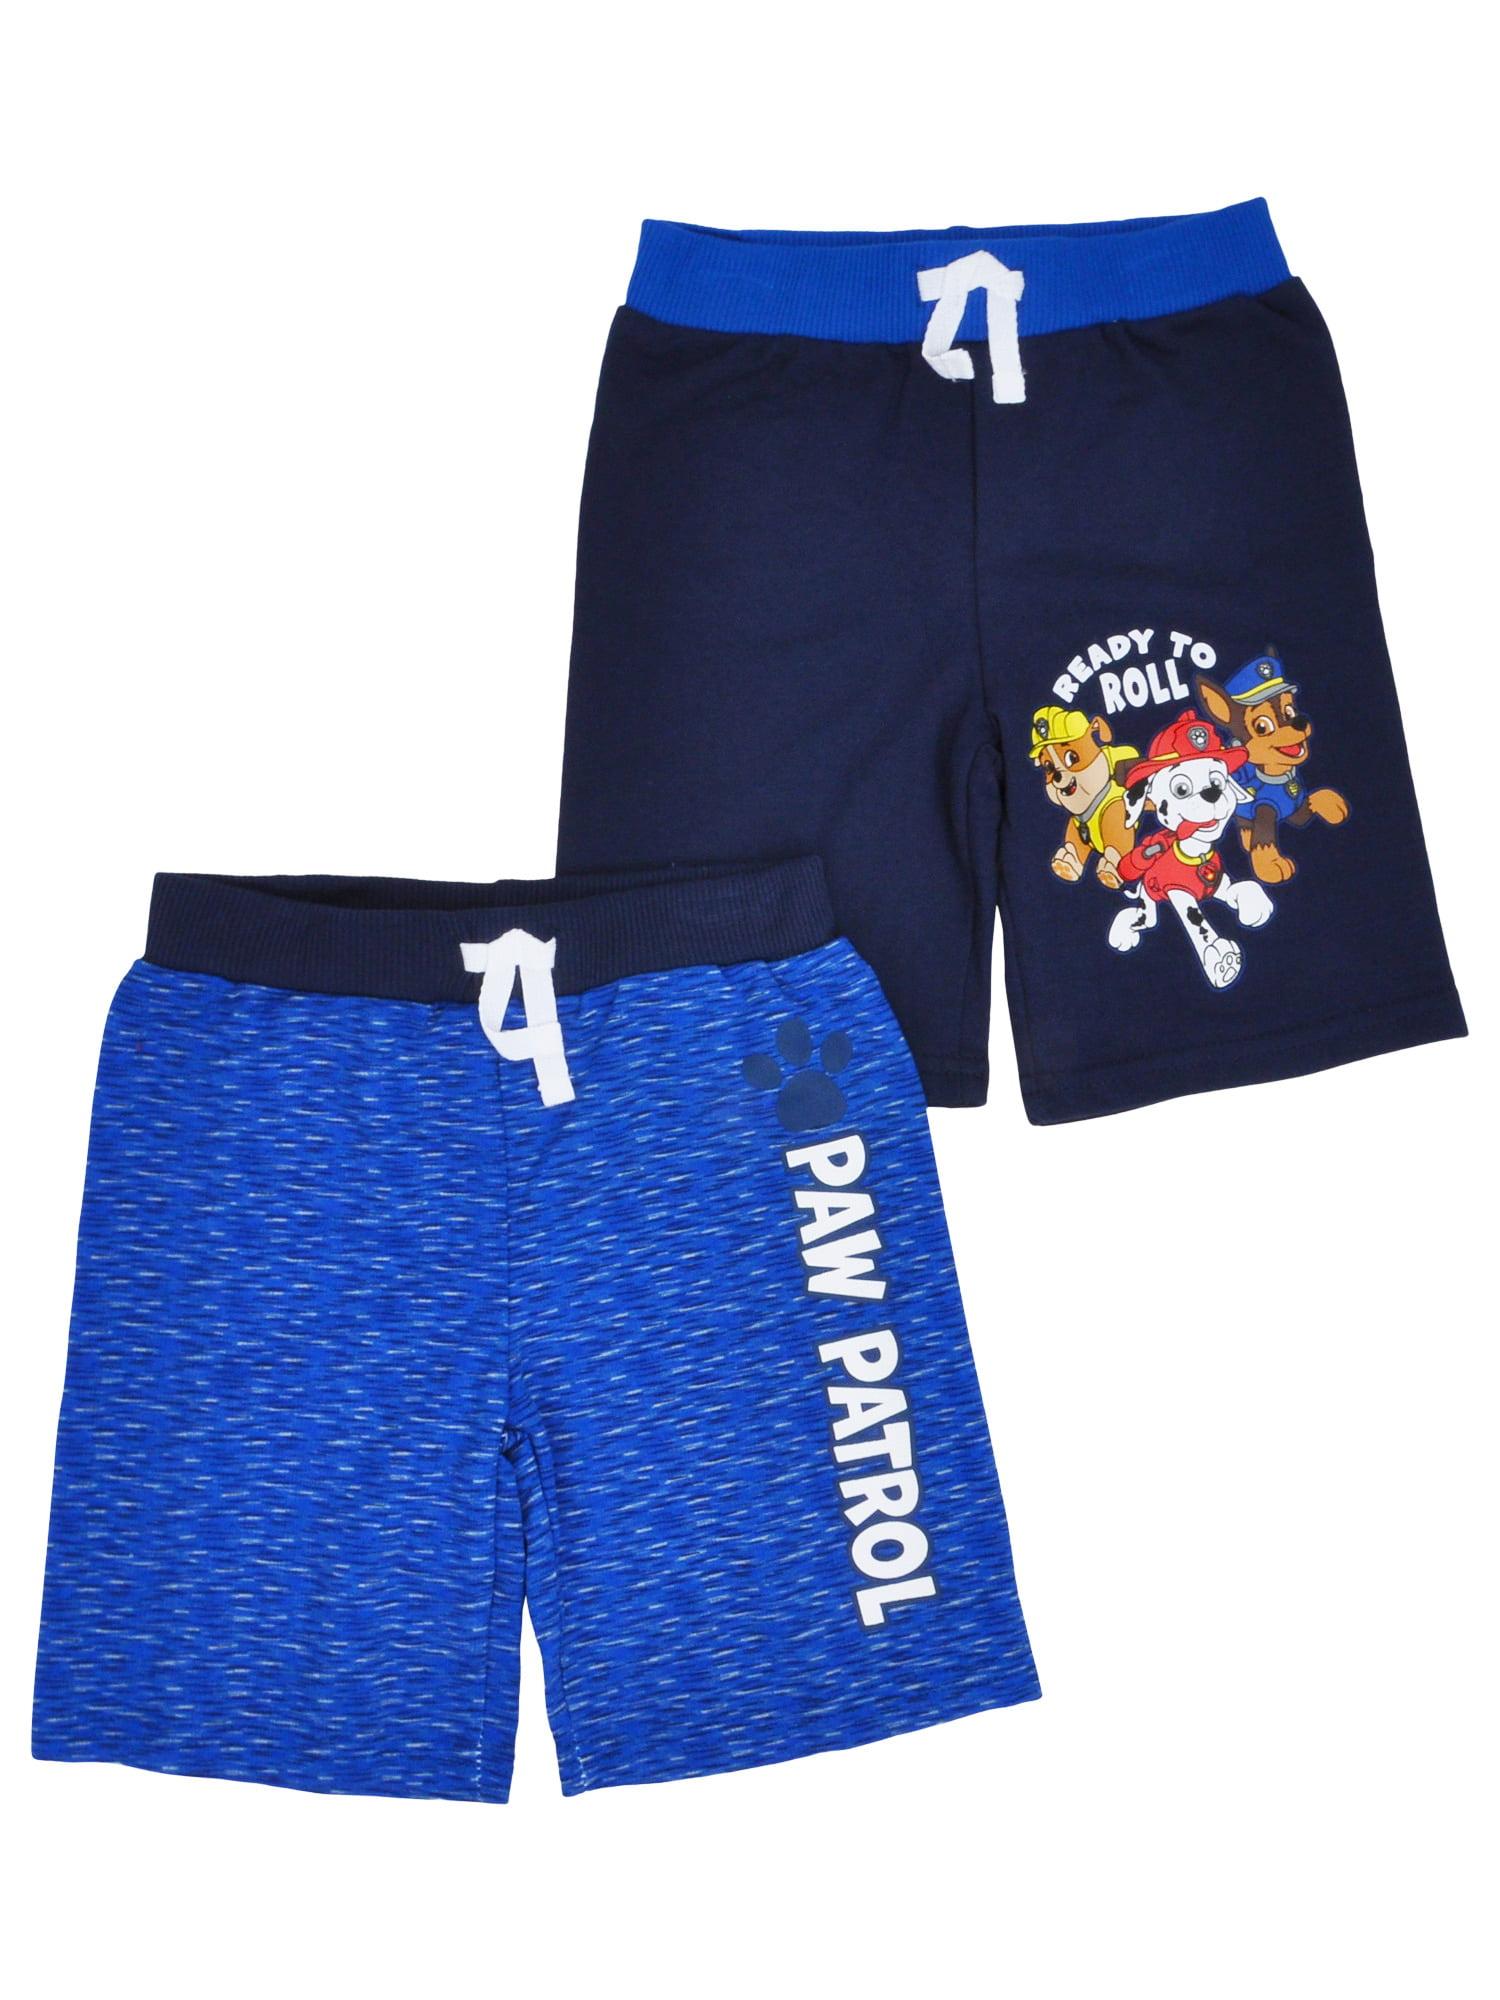 Toddler Boys Paw Patrol Shorts - Chase Marshall Rubble Logo (2-PACK)